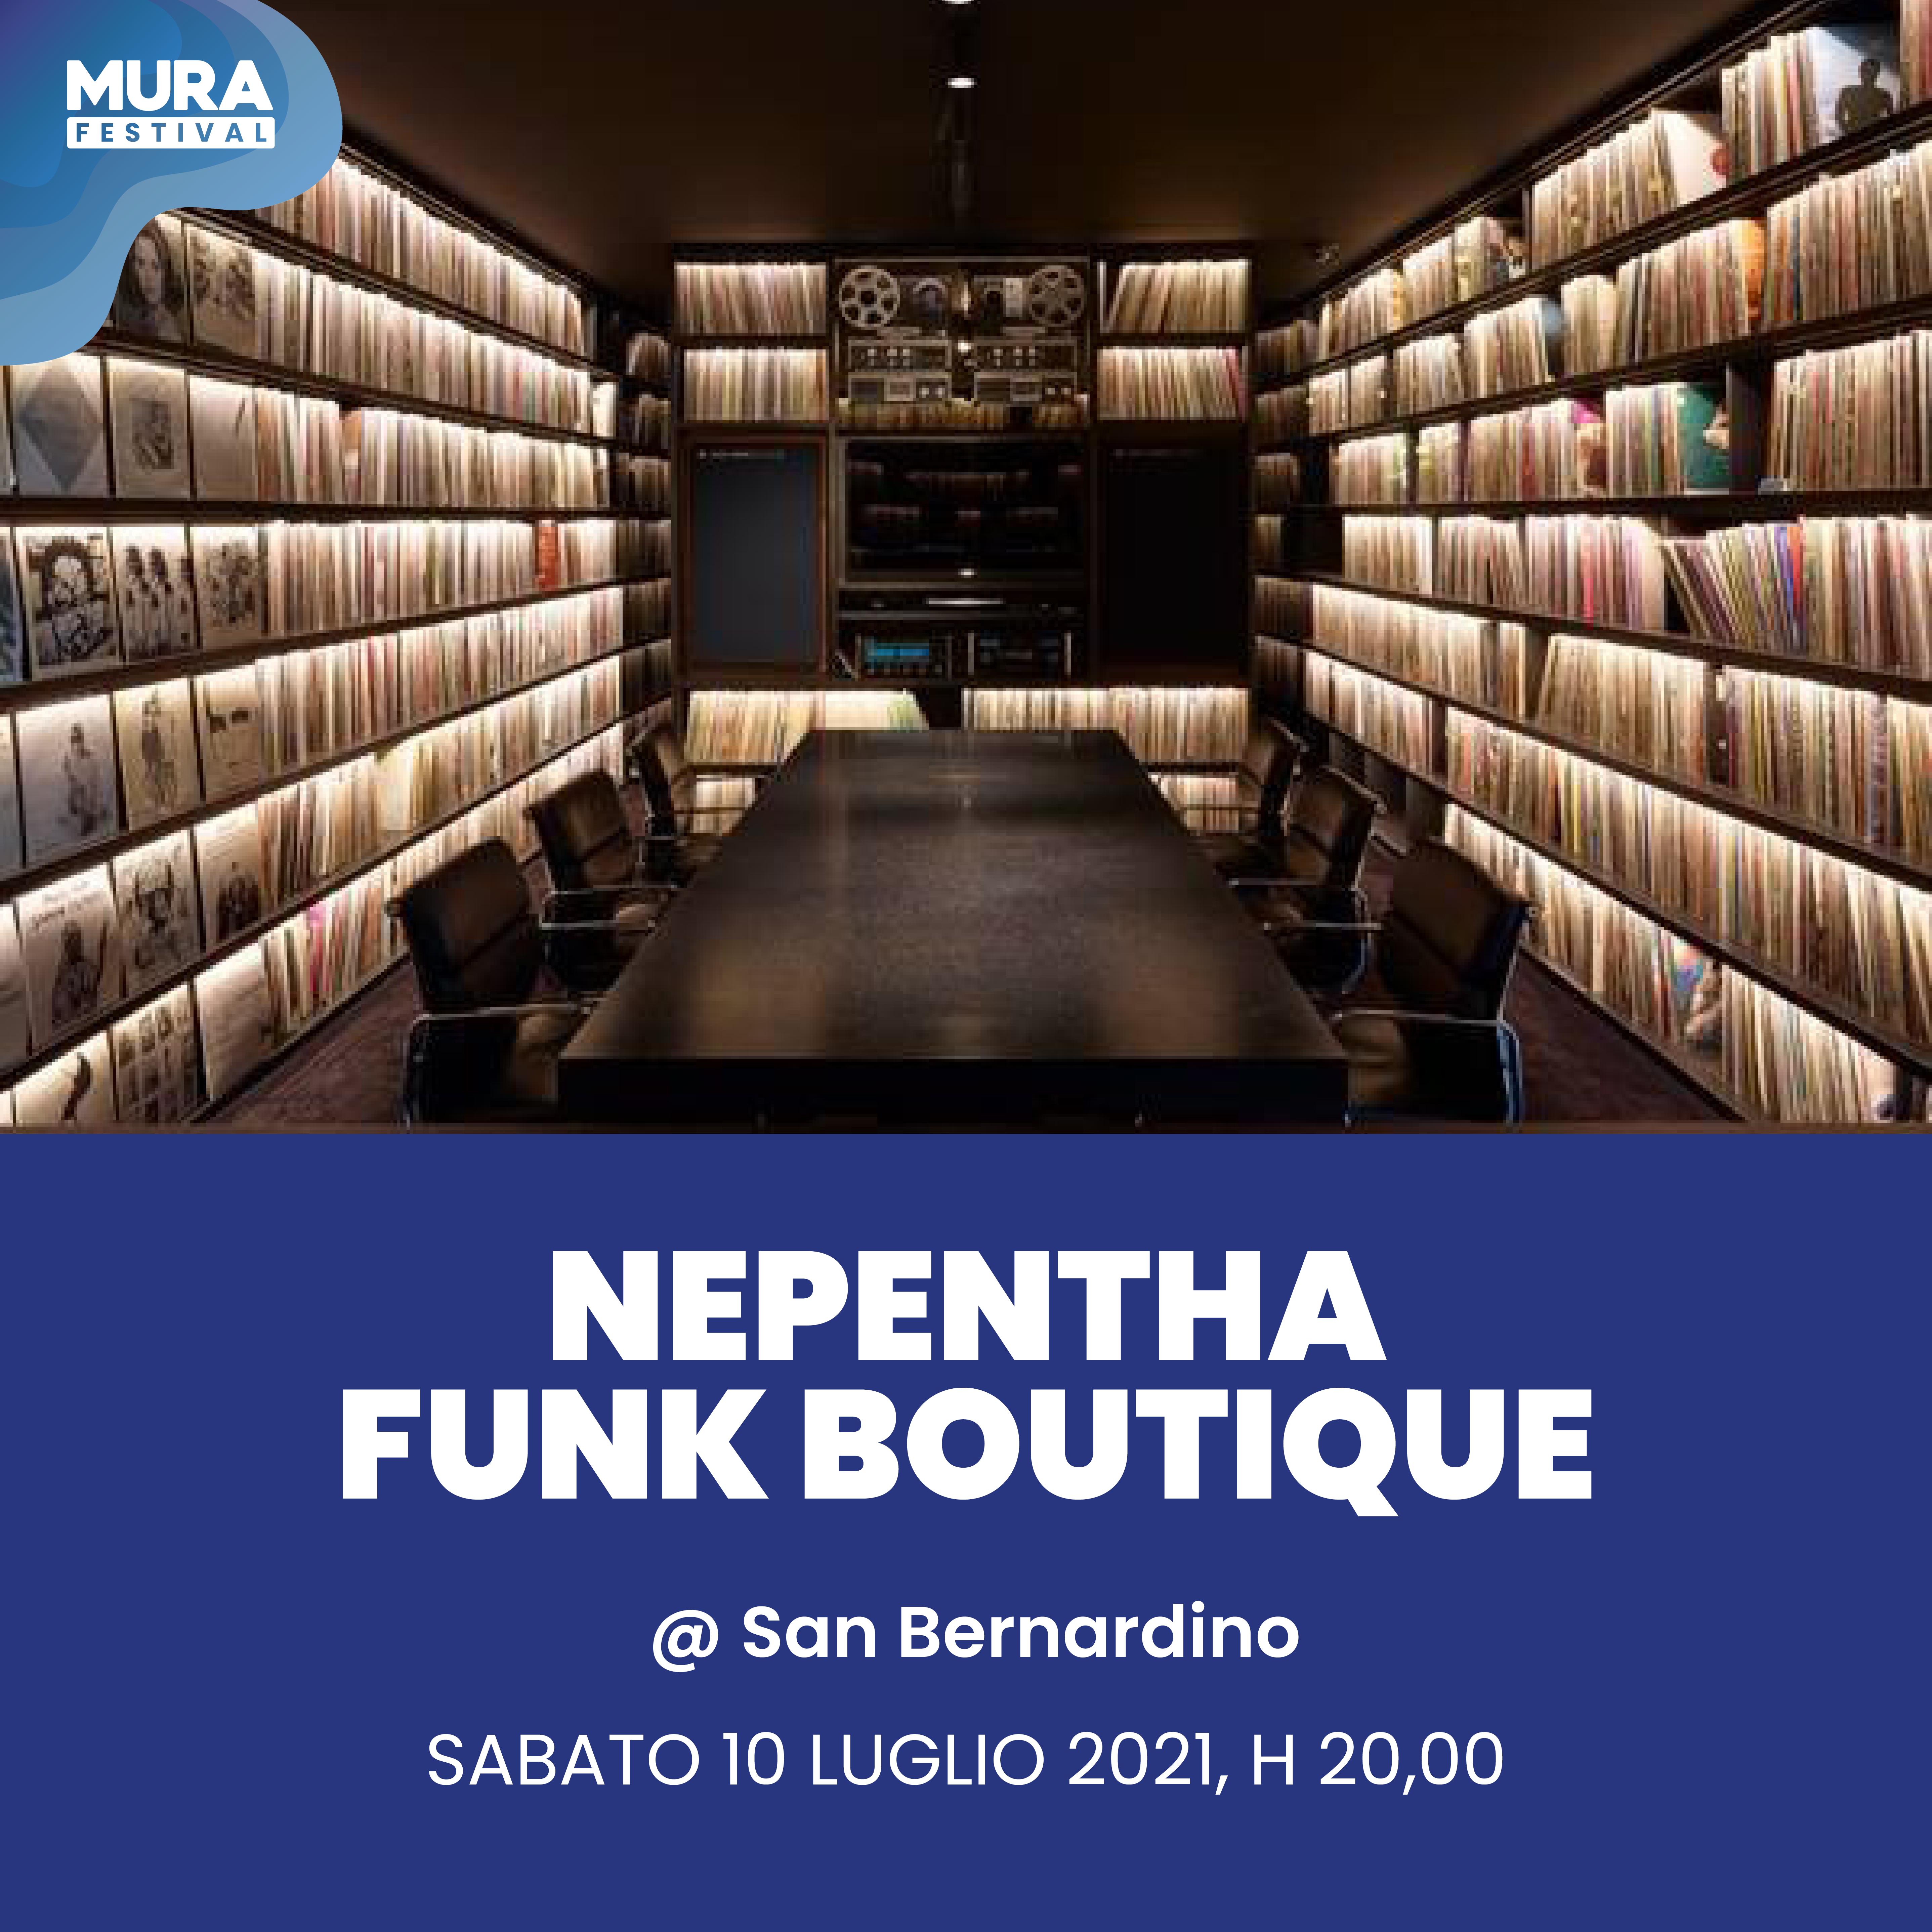 Mura festival - Nepentha Funk boutique